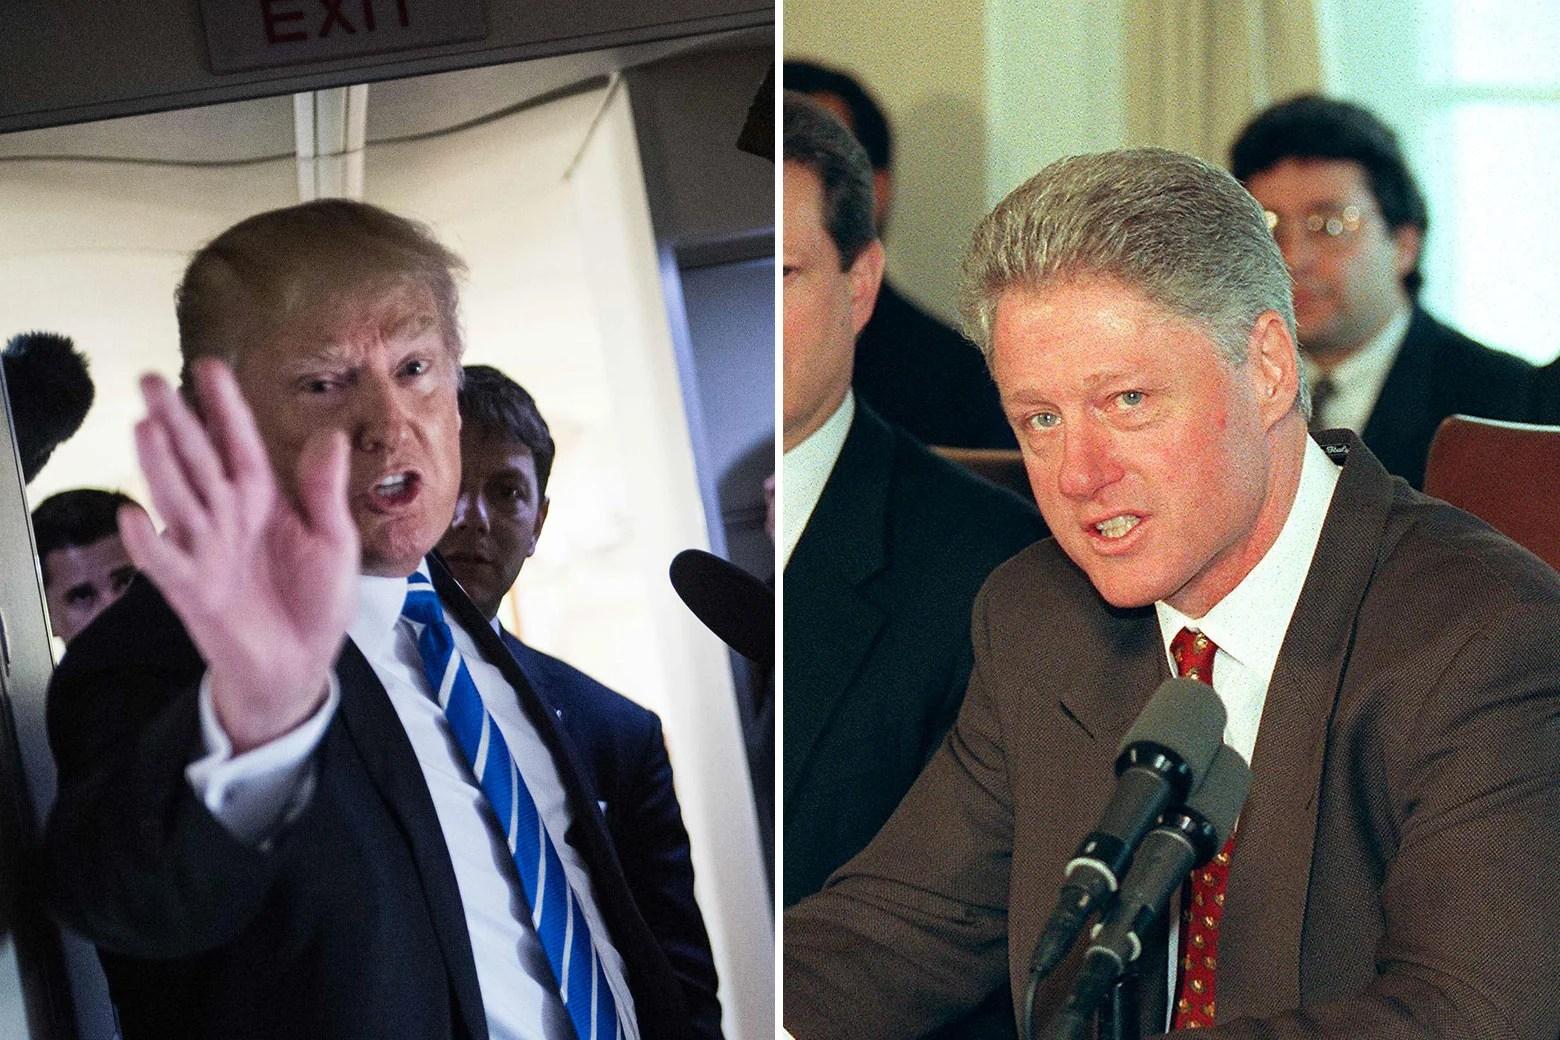 Donald Trump Sounds Like Bill Clinton When He Lies About